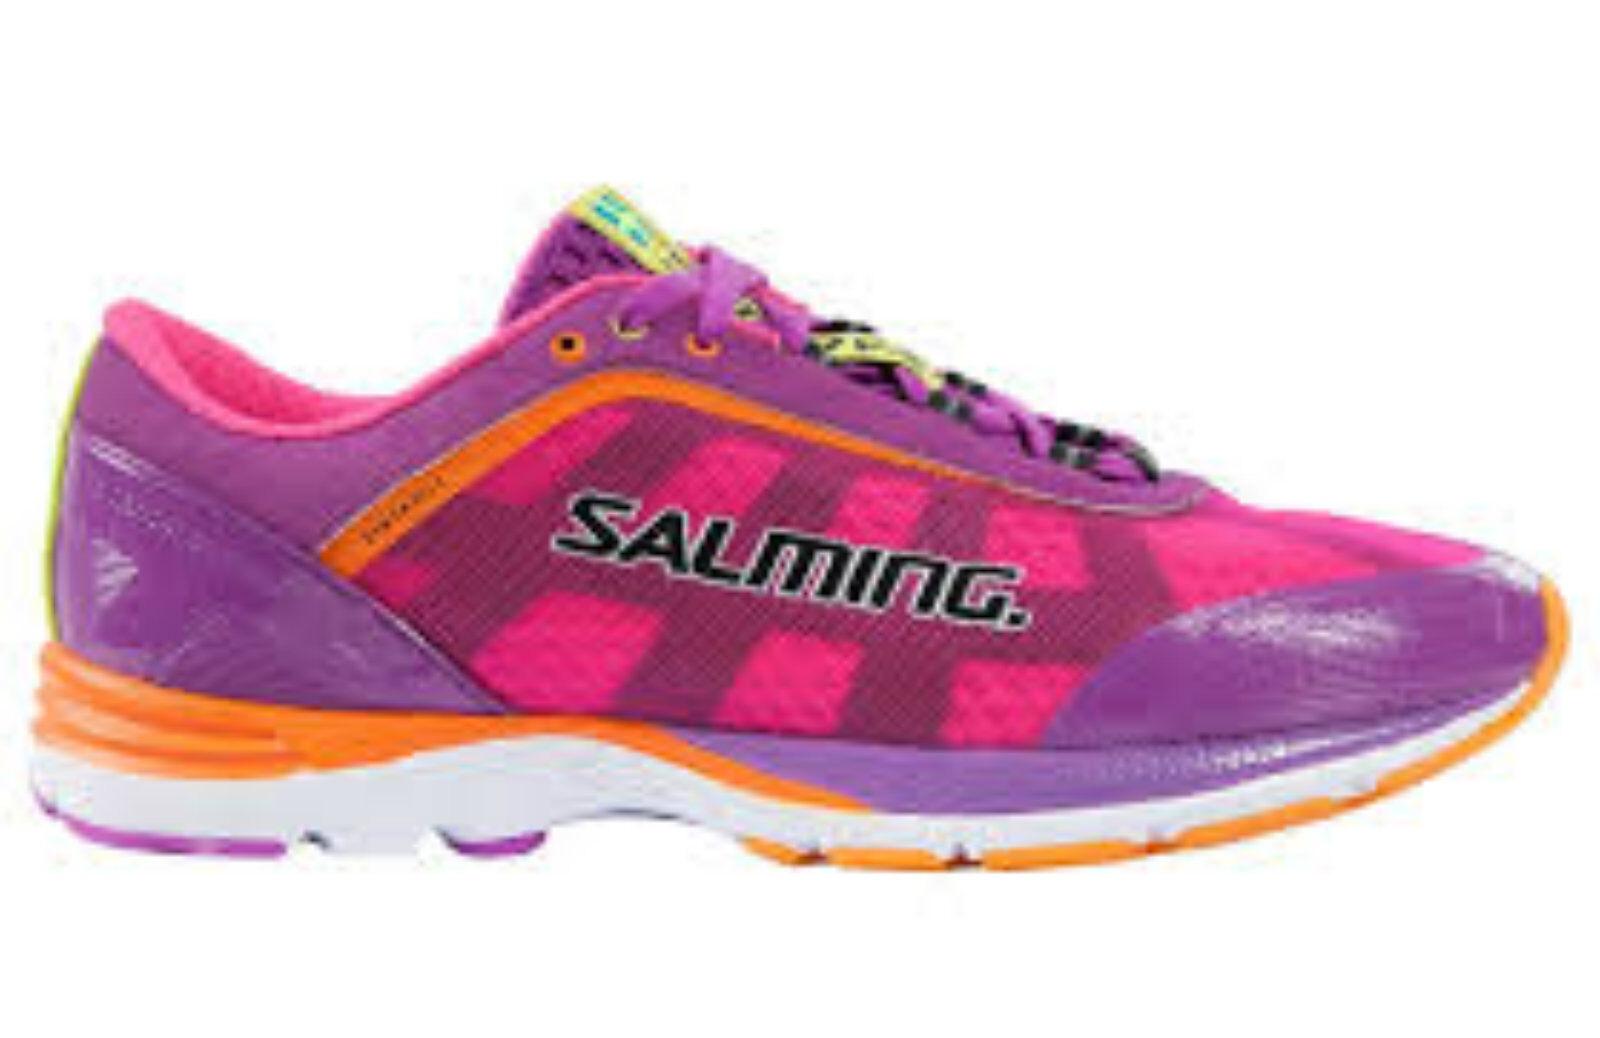 Salming Distance Women's Running shoe  Purple cactus flower UK sz 4.5  new branded